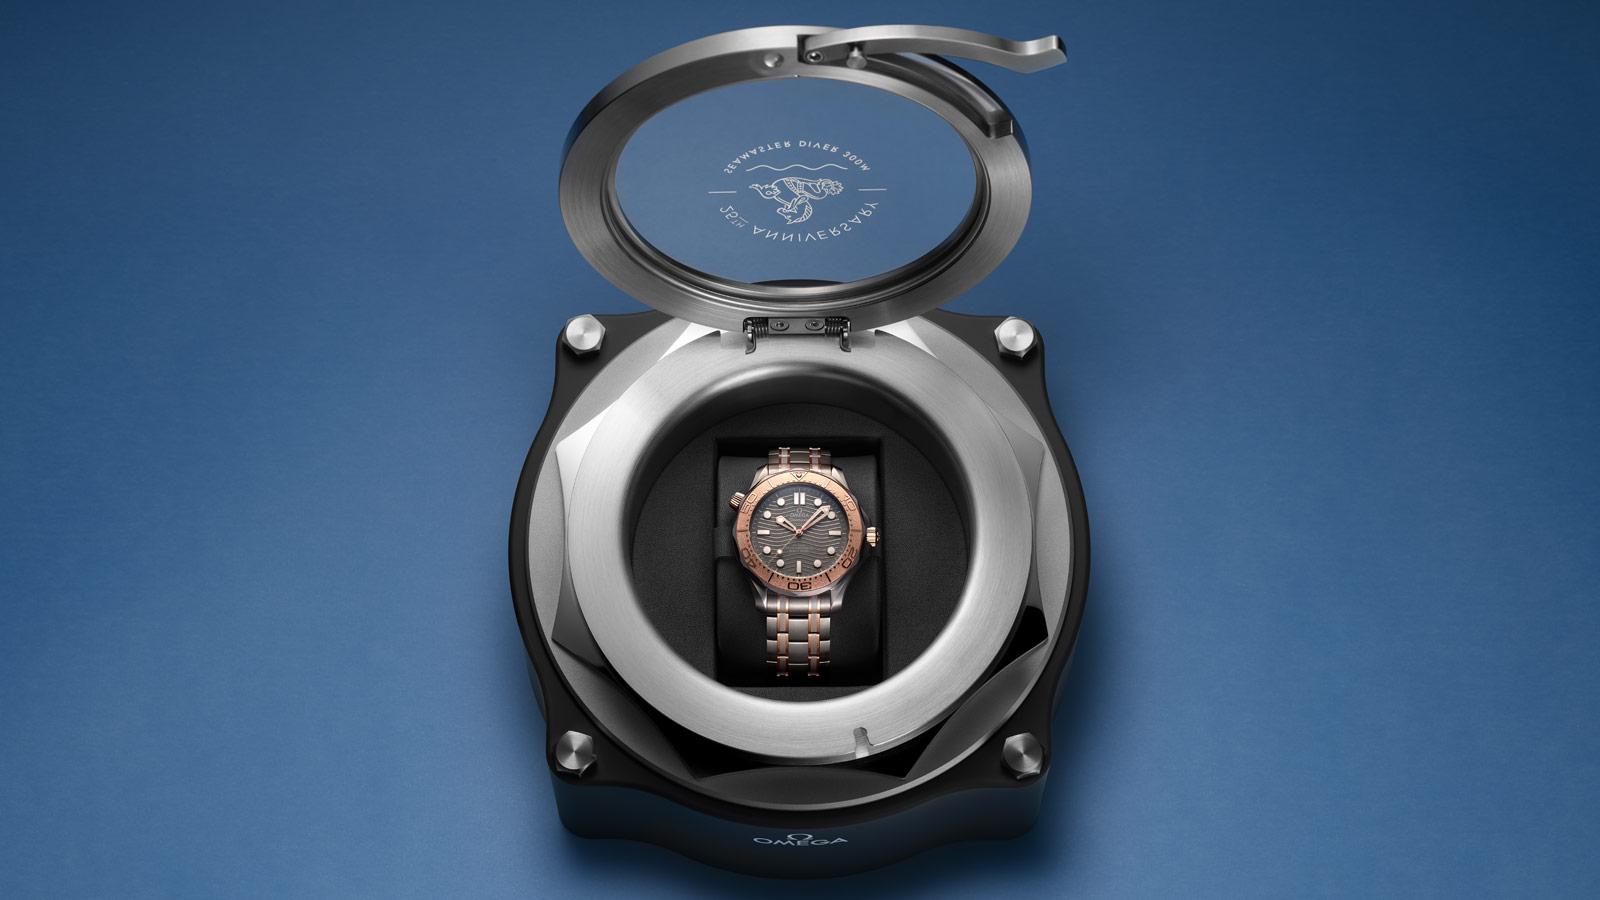 Seamaster 300米潜水表 300米潜水表 欧米茄同轴•至臻天文台表42毫米 腕表 - 210.60.42.20.99.001